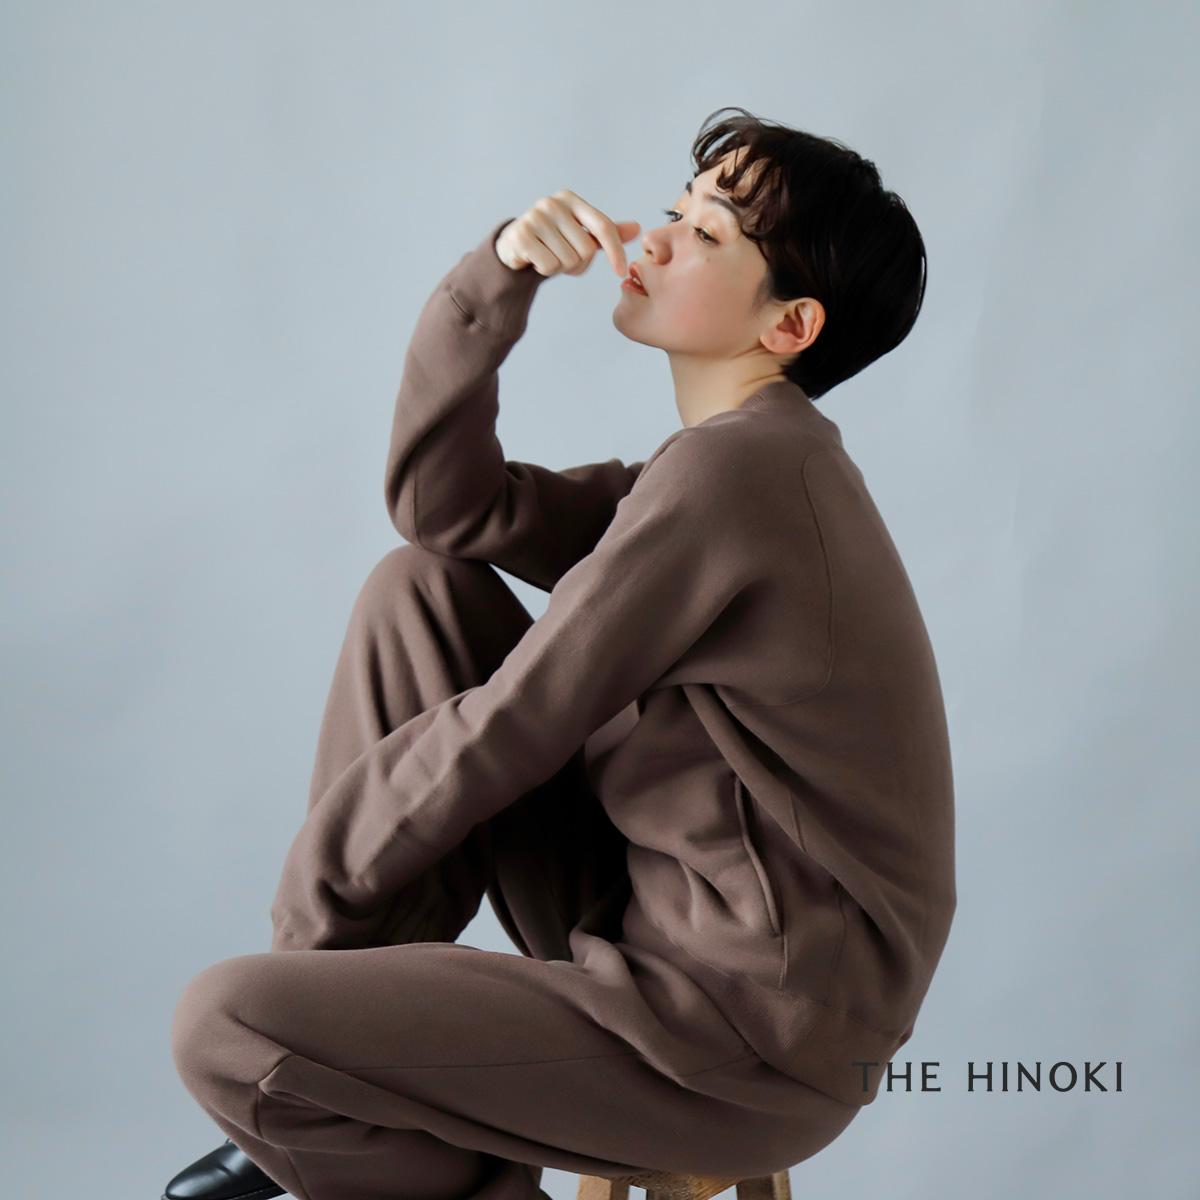 THE HINOKI(ザ ヒノキ)オーガニックコットン裏起毛スウェットシャツ th21w-40